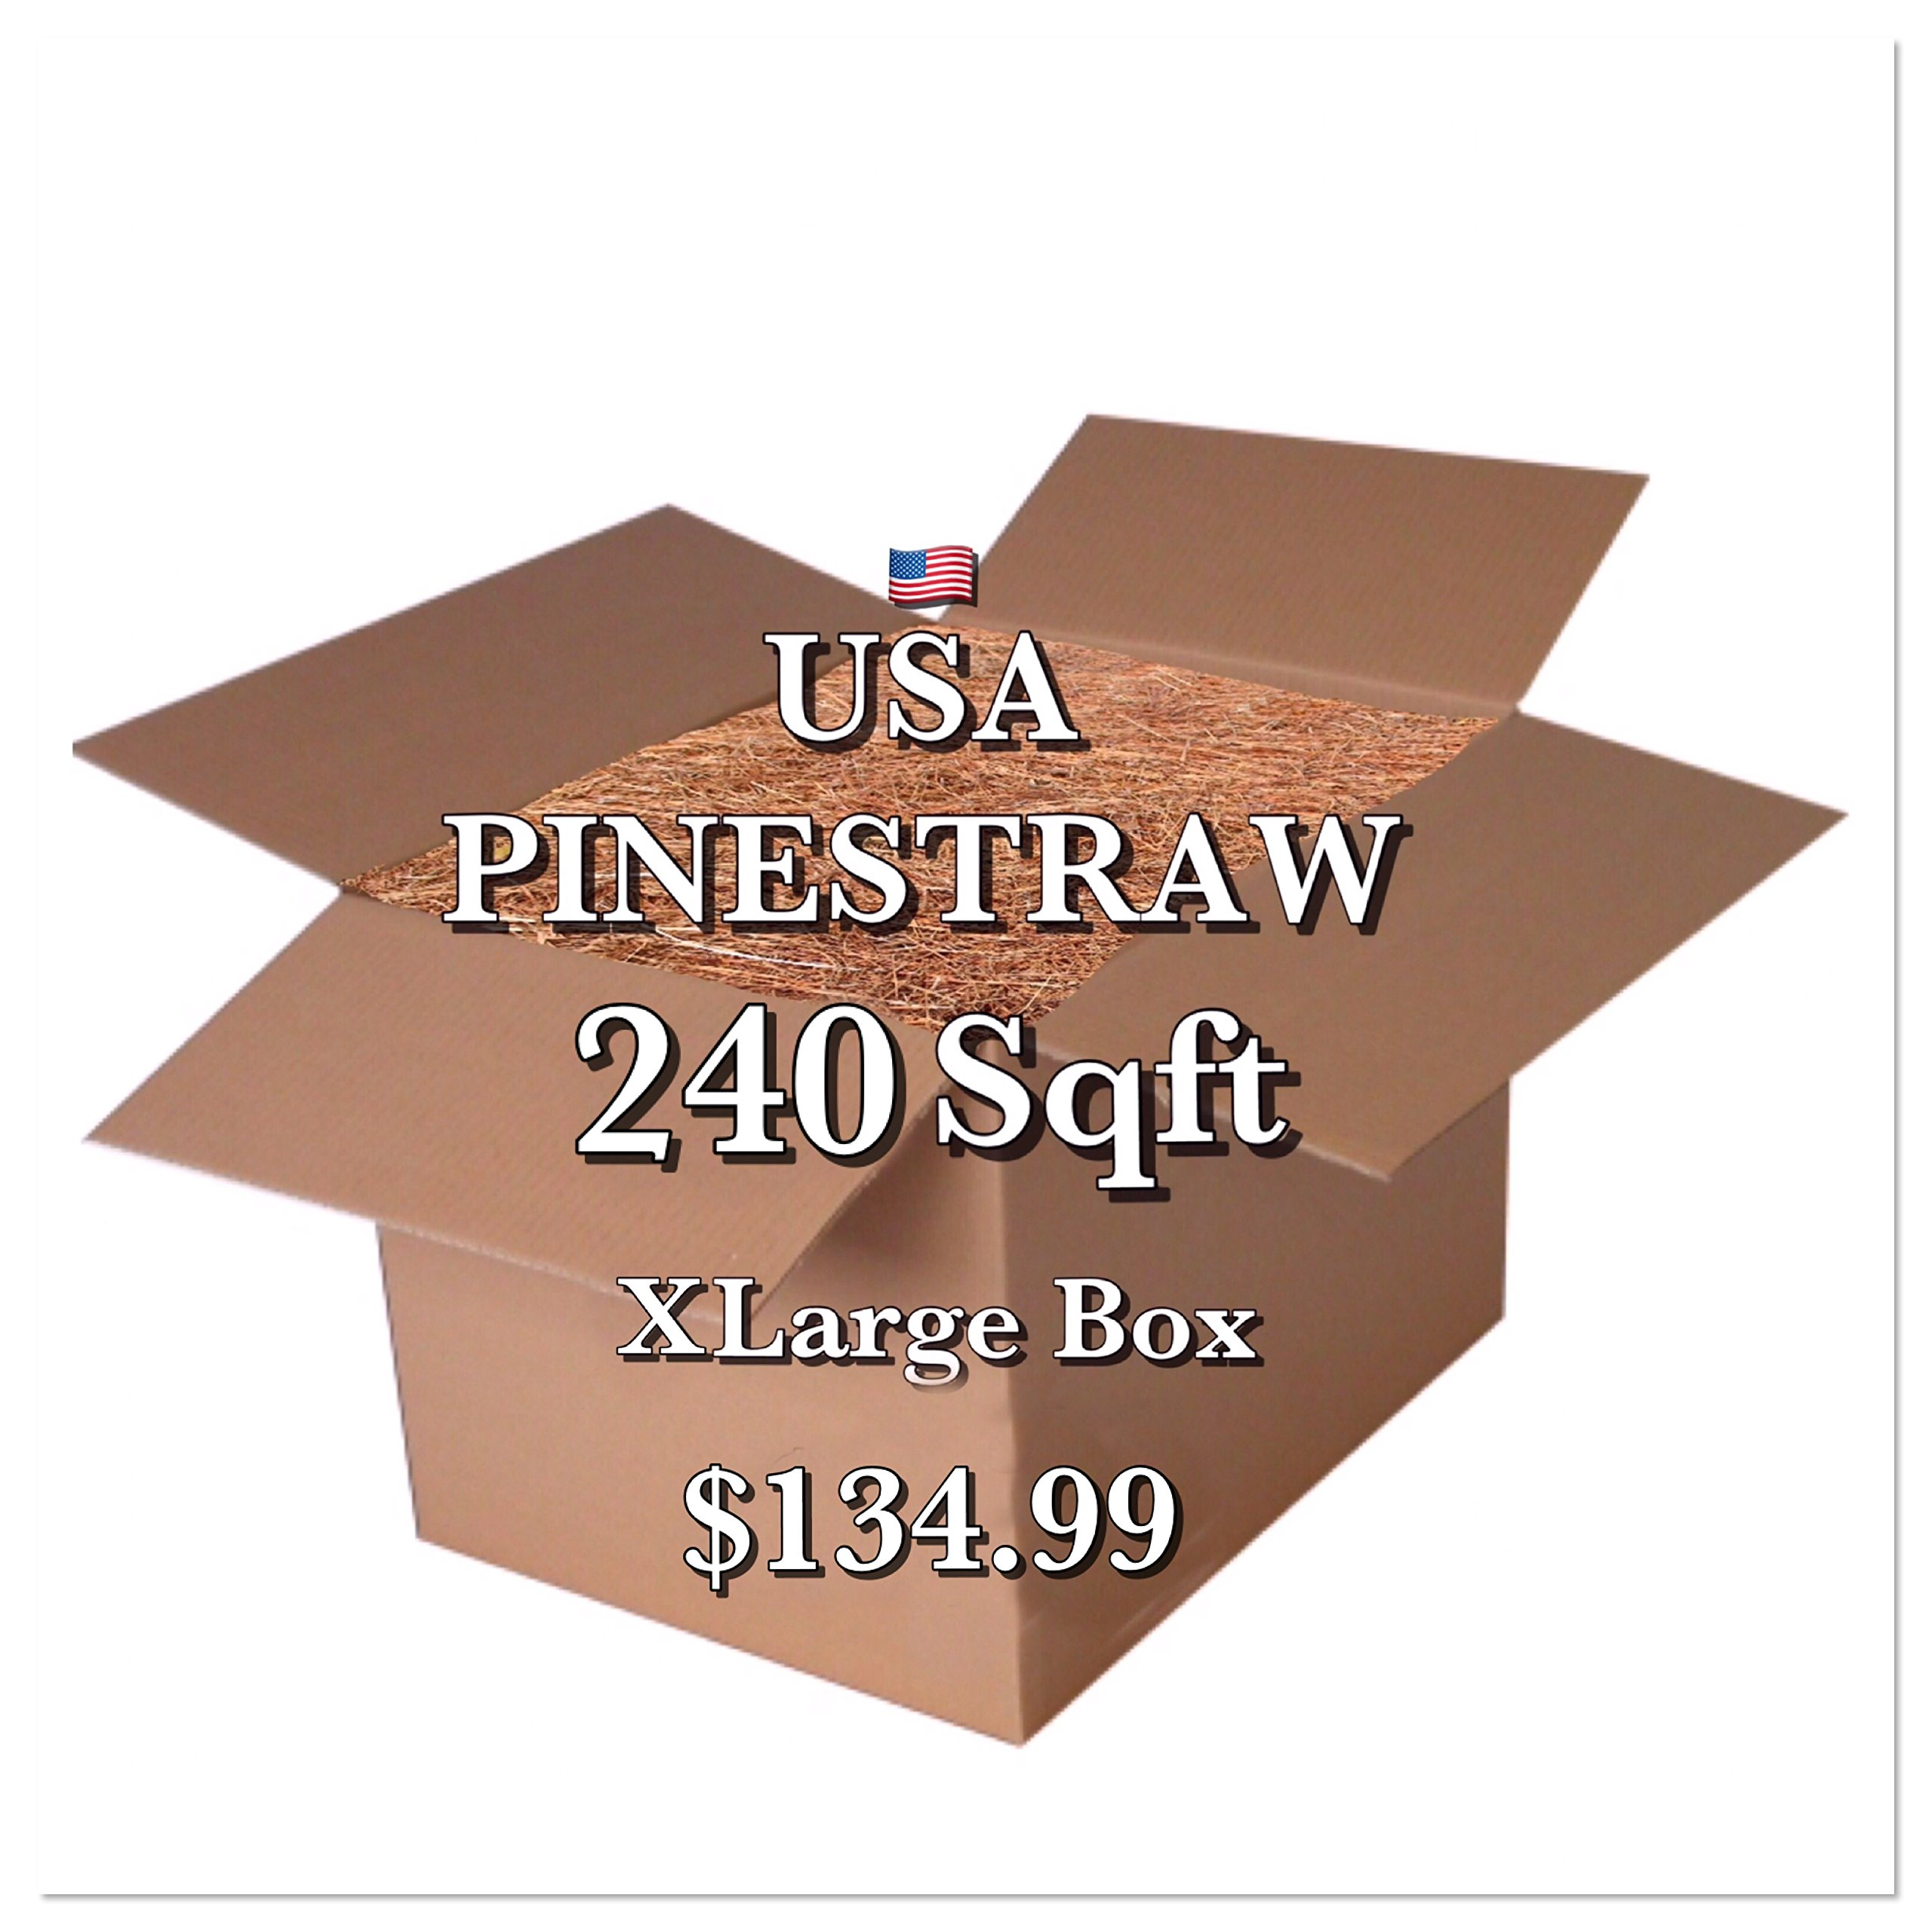 Pine Straw Mulch - 14 '' Premium Long Needle - 240 Sqft - New Bigger Box